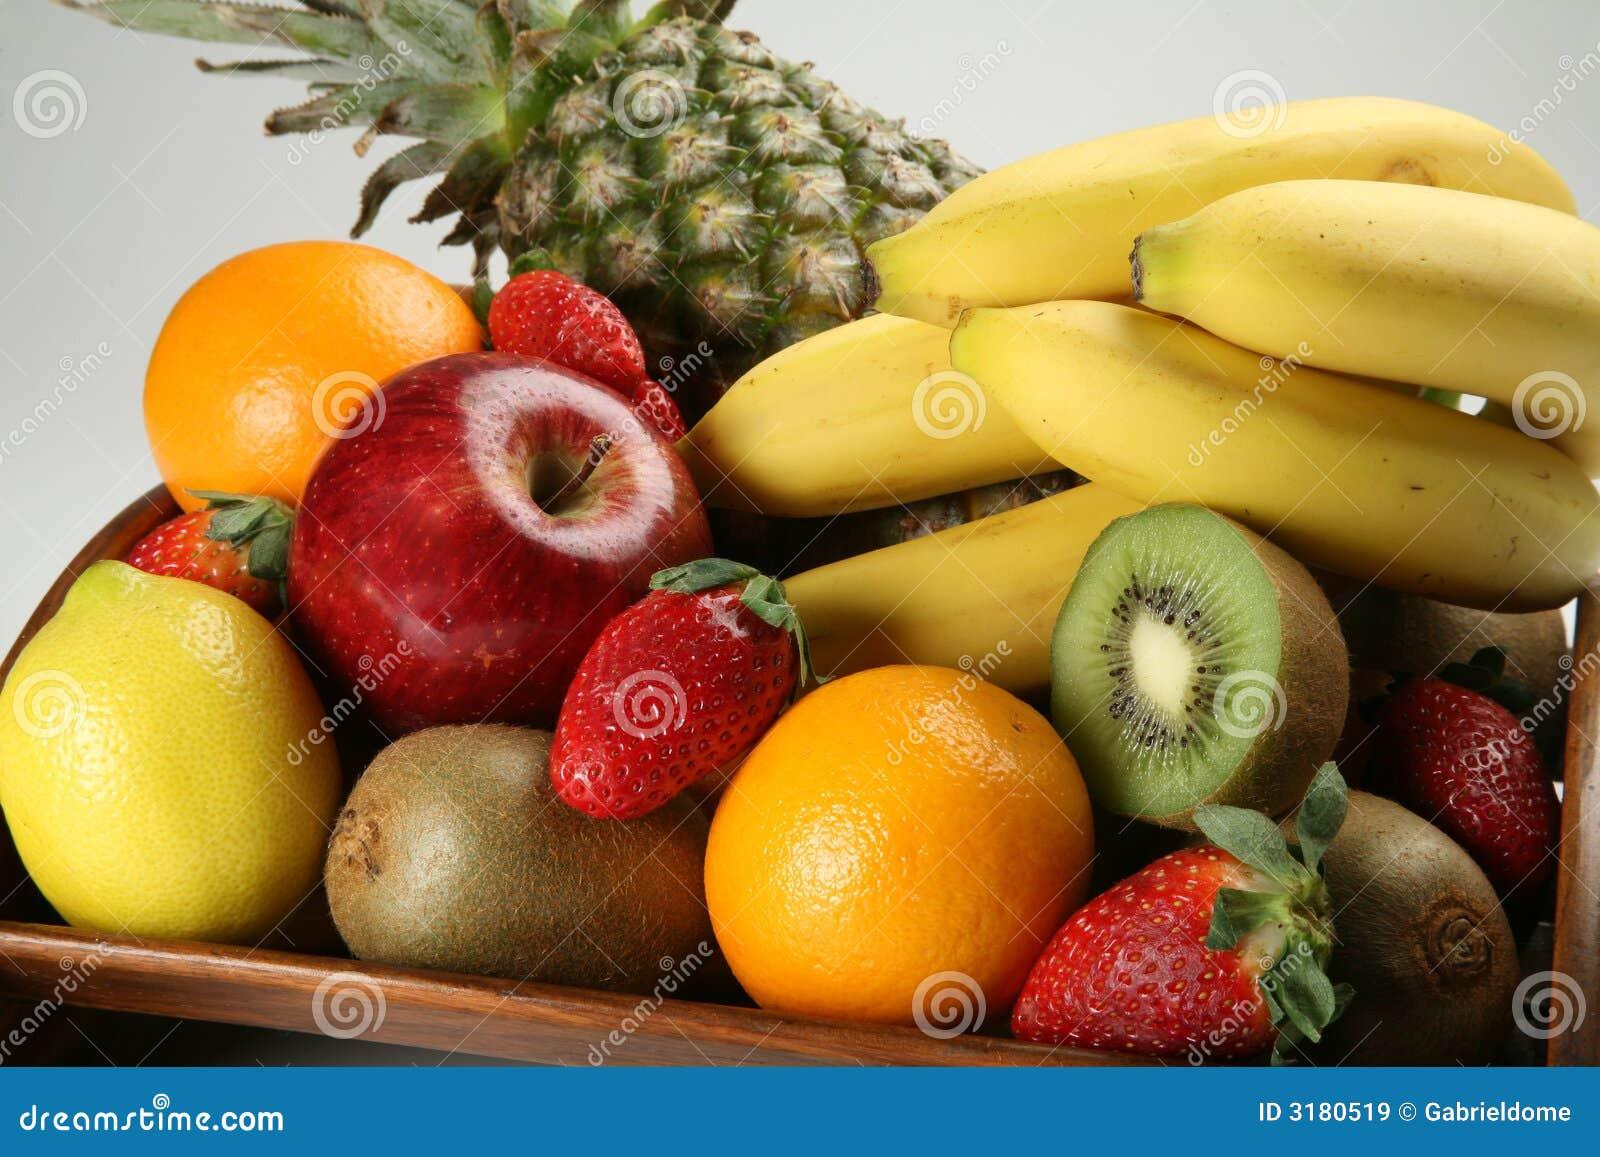 Fruit Bowl With Fresh Fruits Stock Image Image Of Food